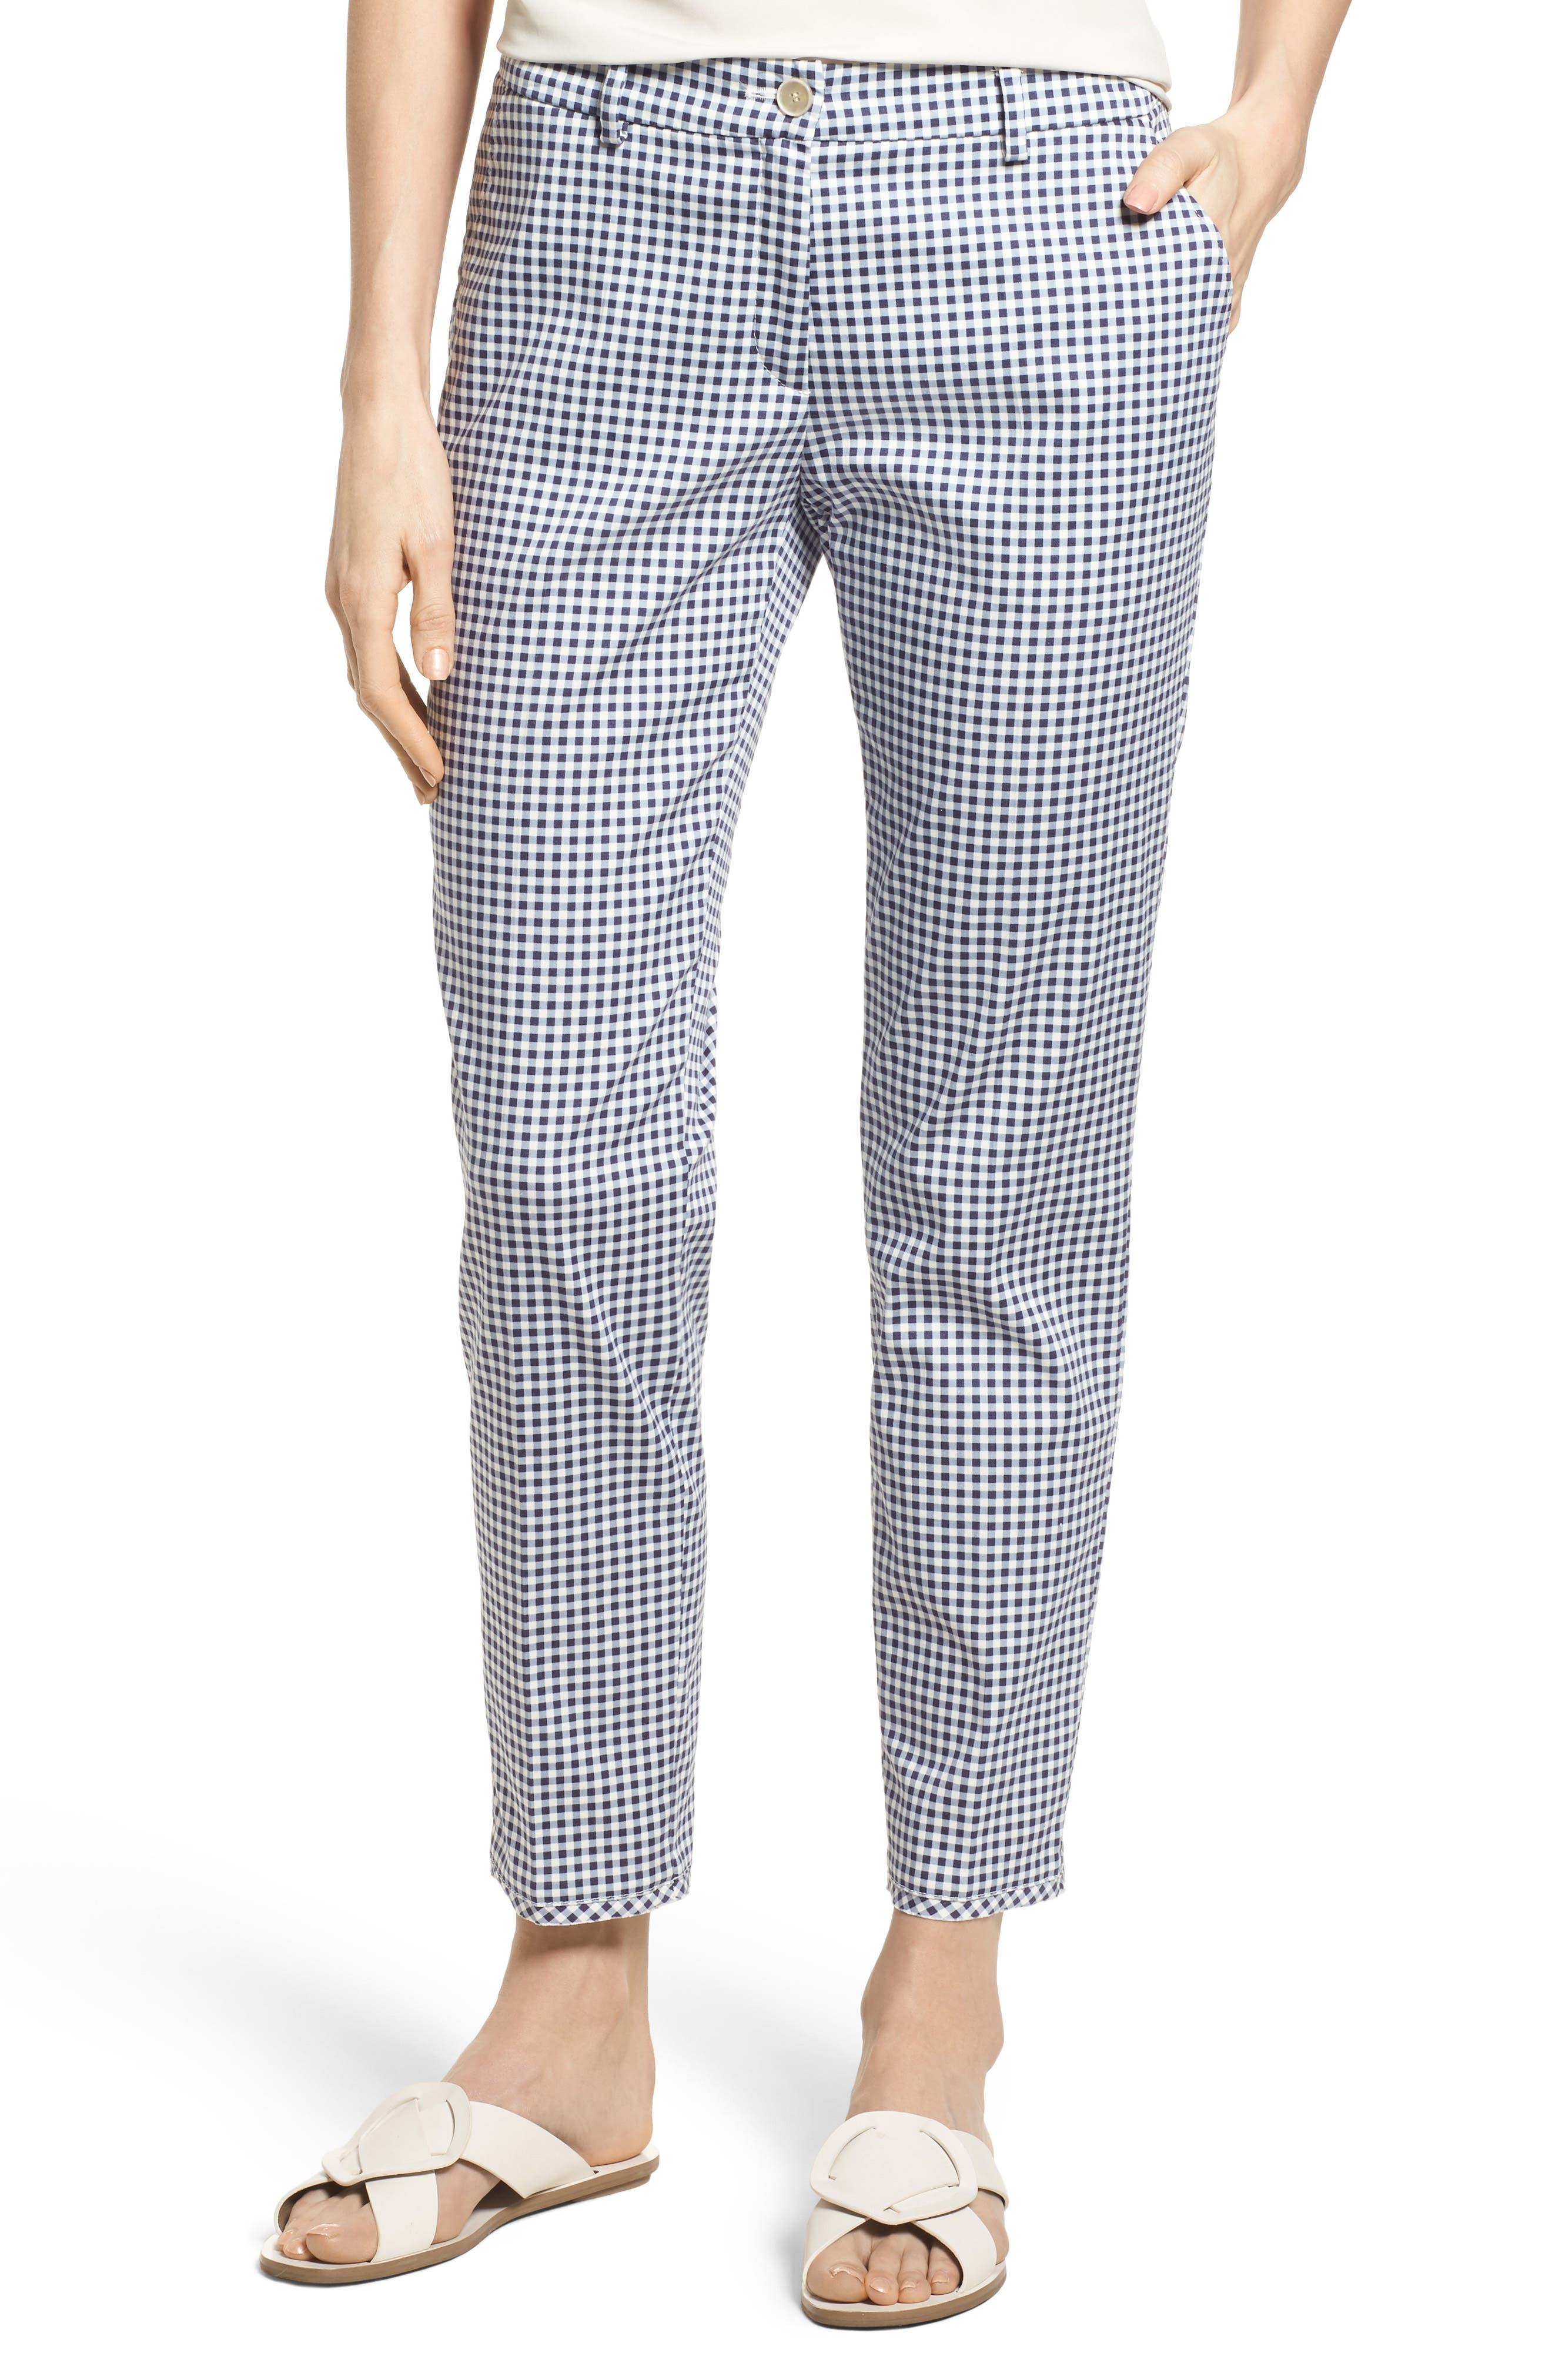 Maron Gingham Stretch Cotton Pants,                             Main thumbnail 1, color,                             OCEAN